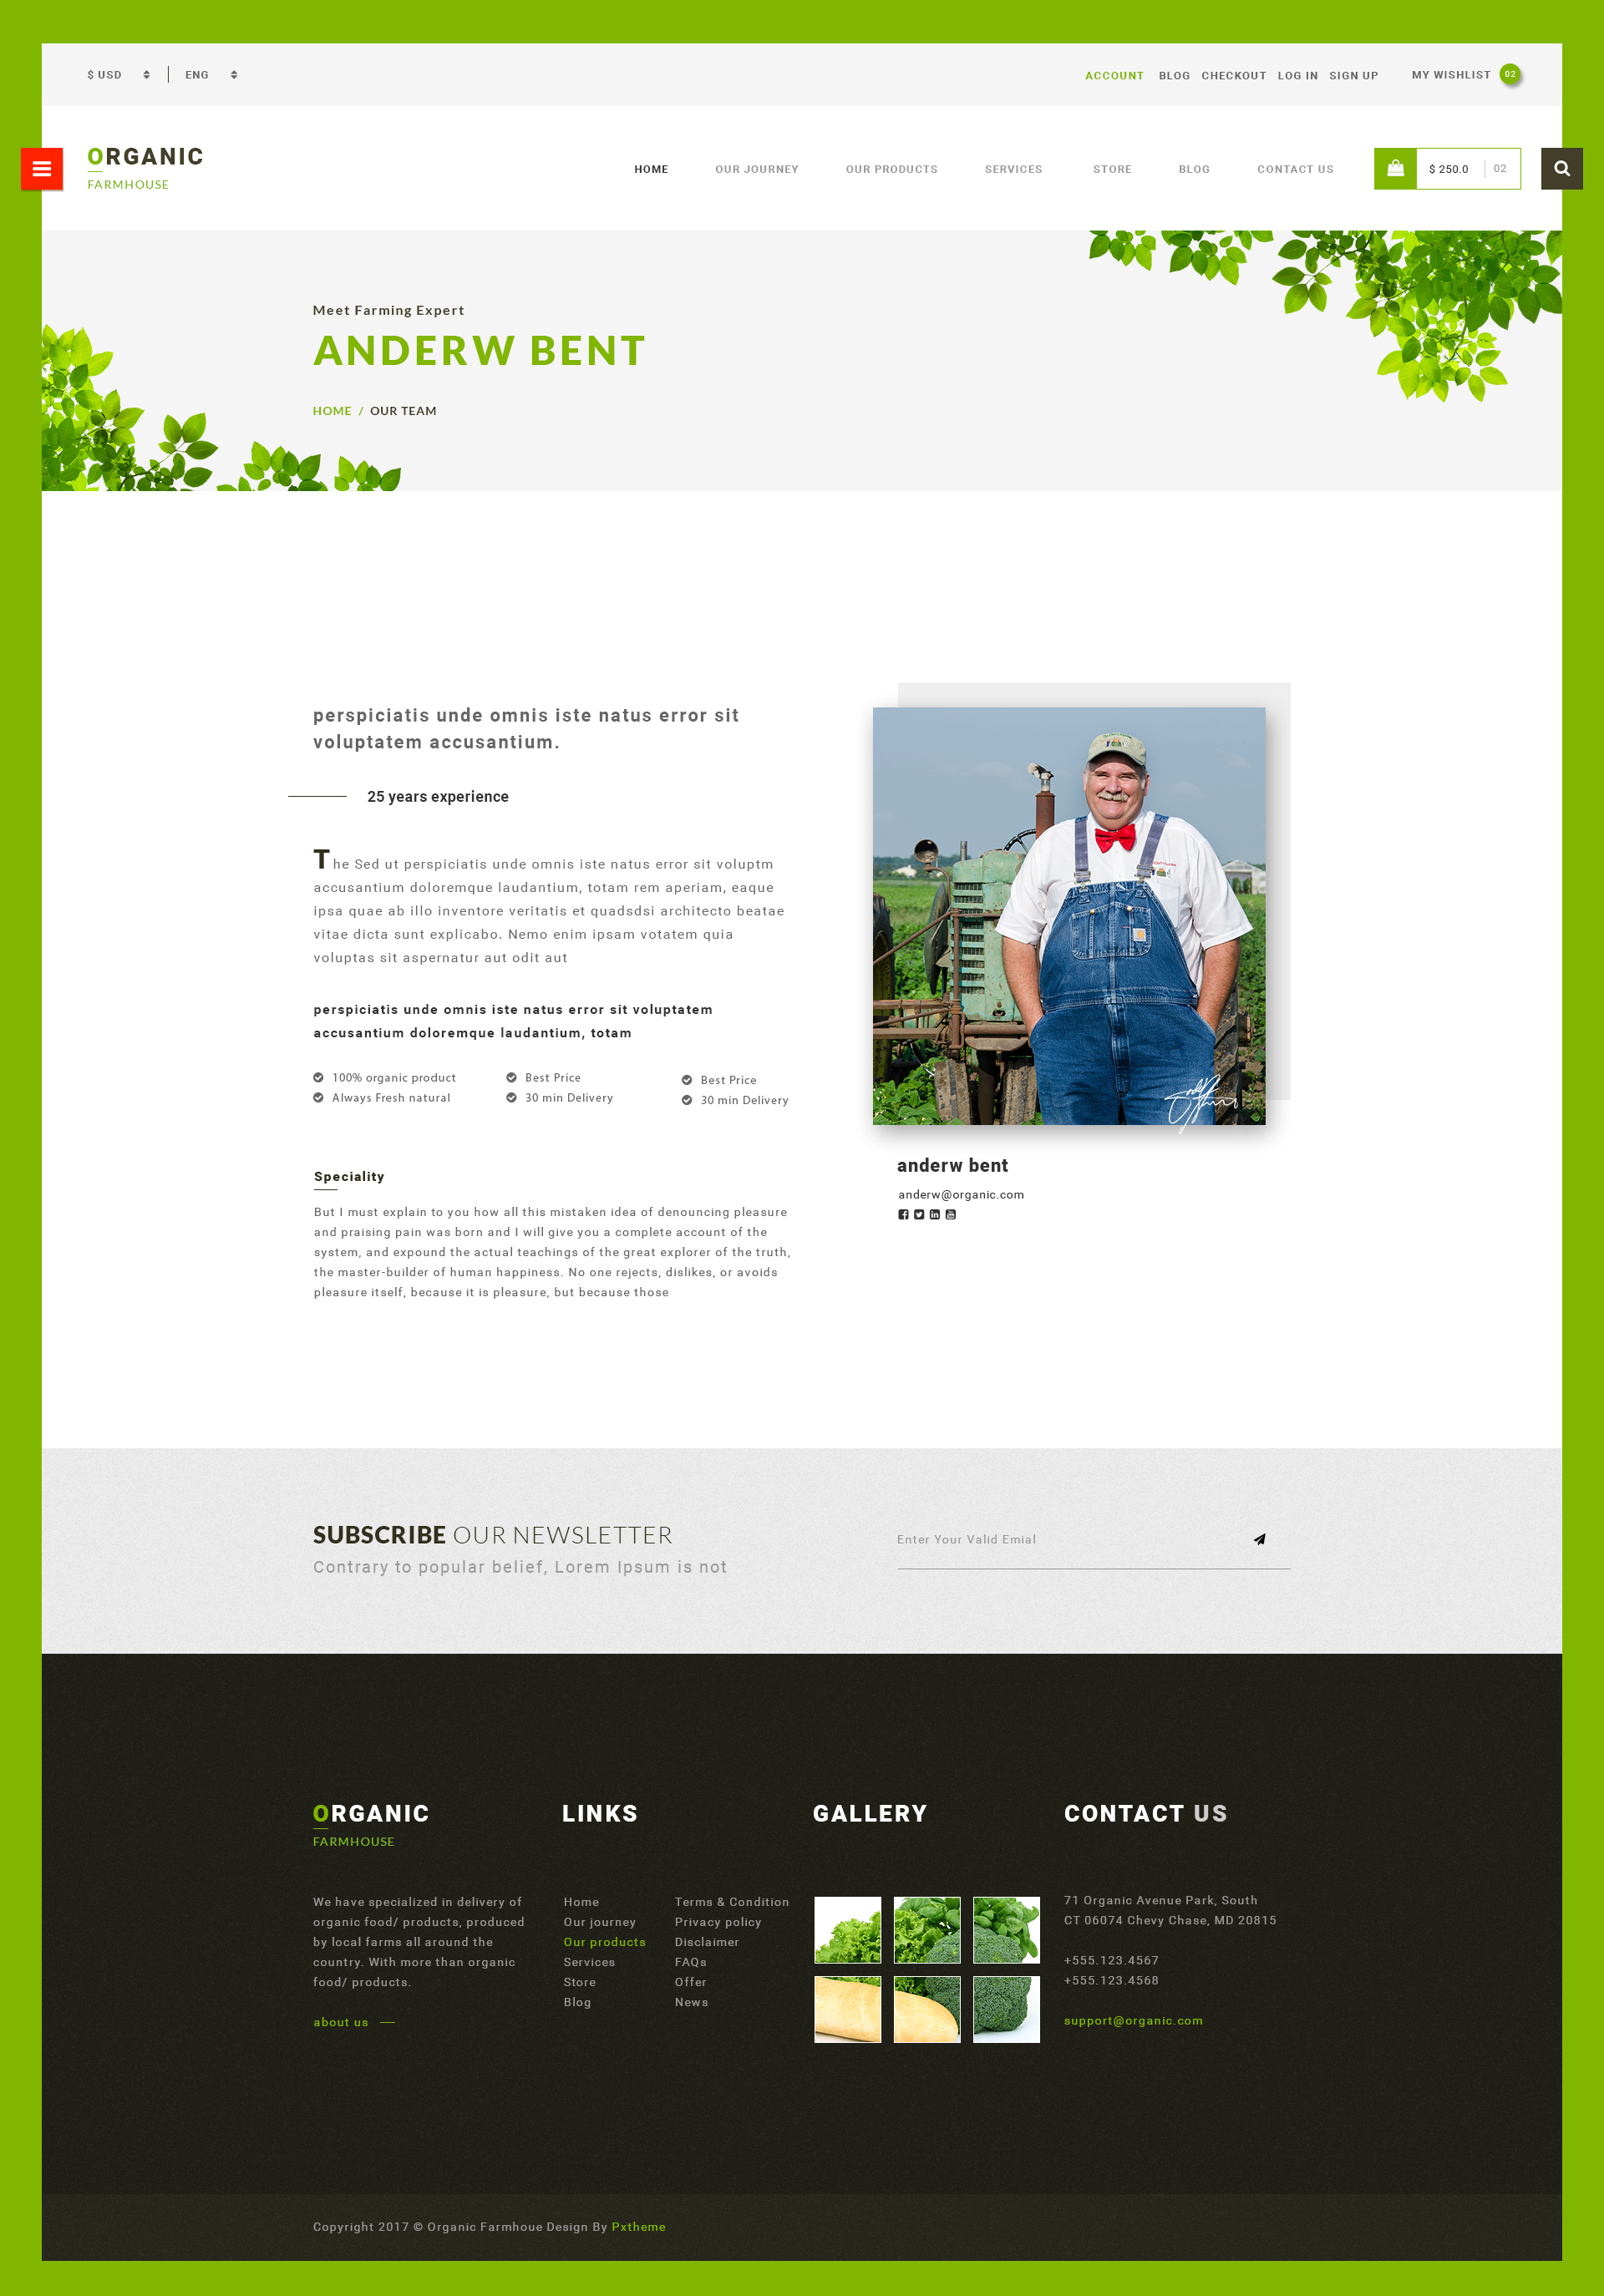 Organic Store PSD Template By Govindsaini ThemeForest - Invoice maker free download rocco online store